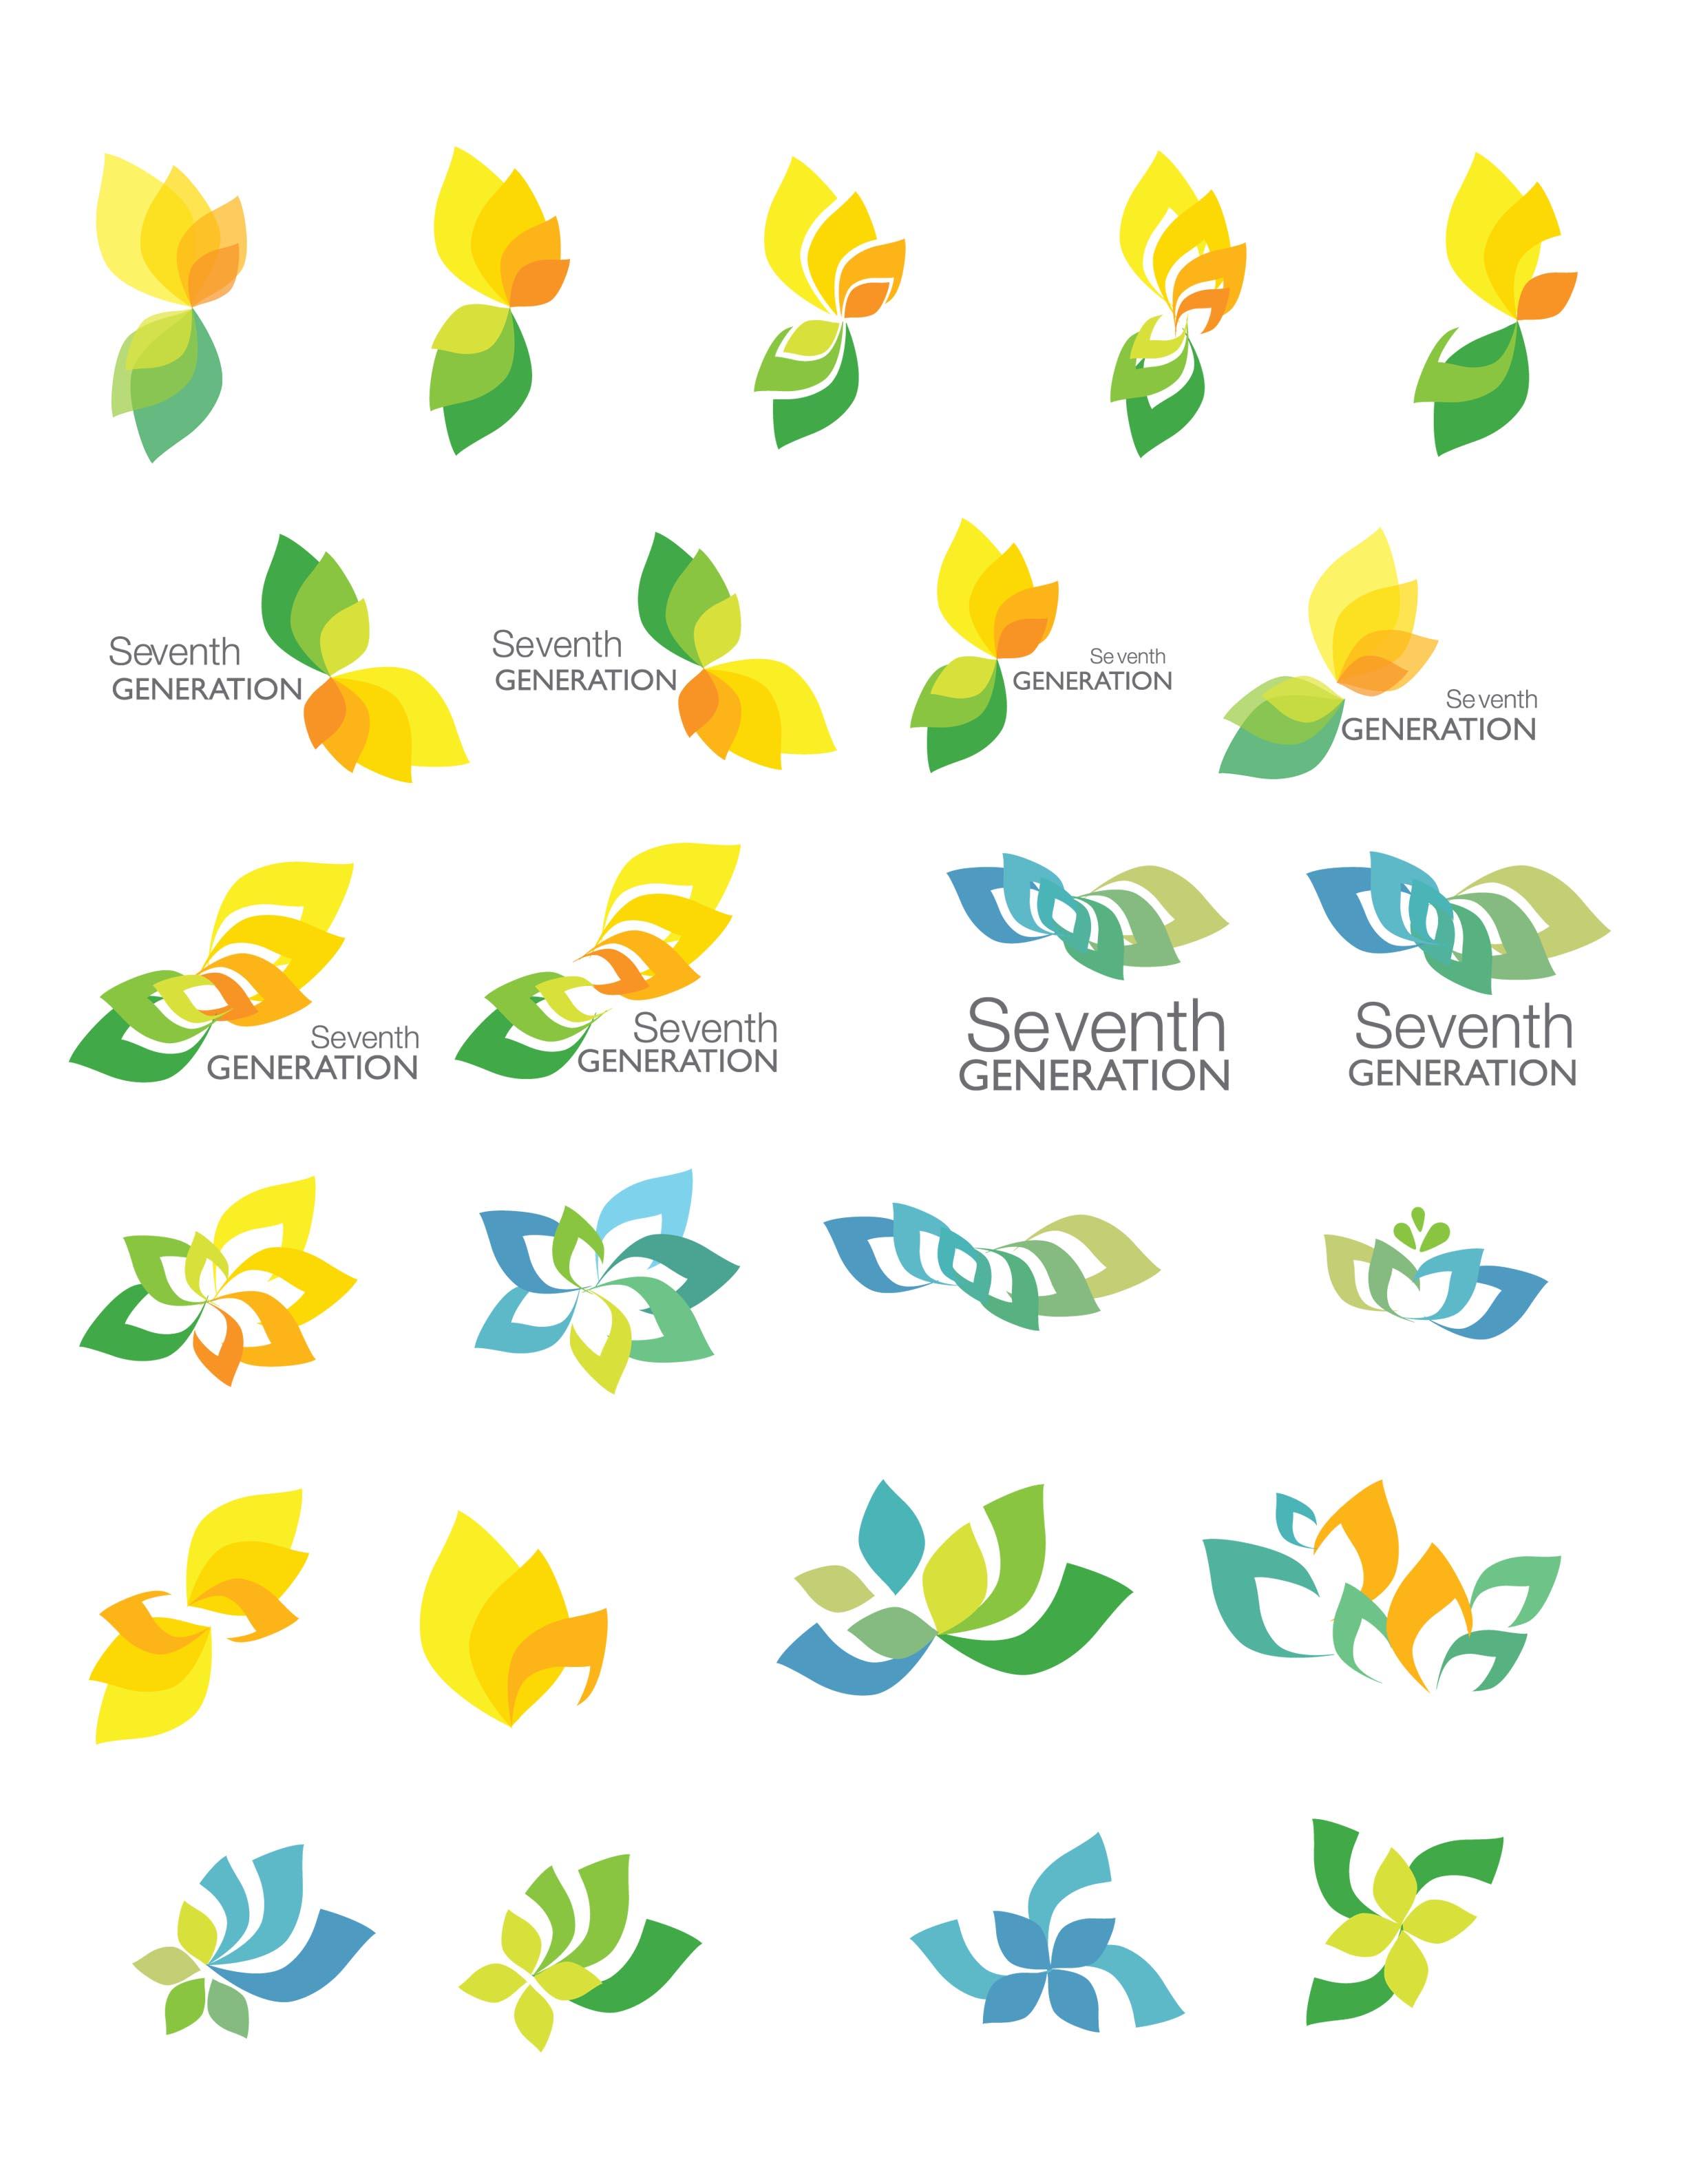 Seventh generation logo clipart clip art royalty free download The Seventh Generation Logo Redesign: Part 2— Exploring ... clip art royalty free download